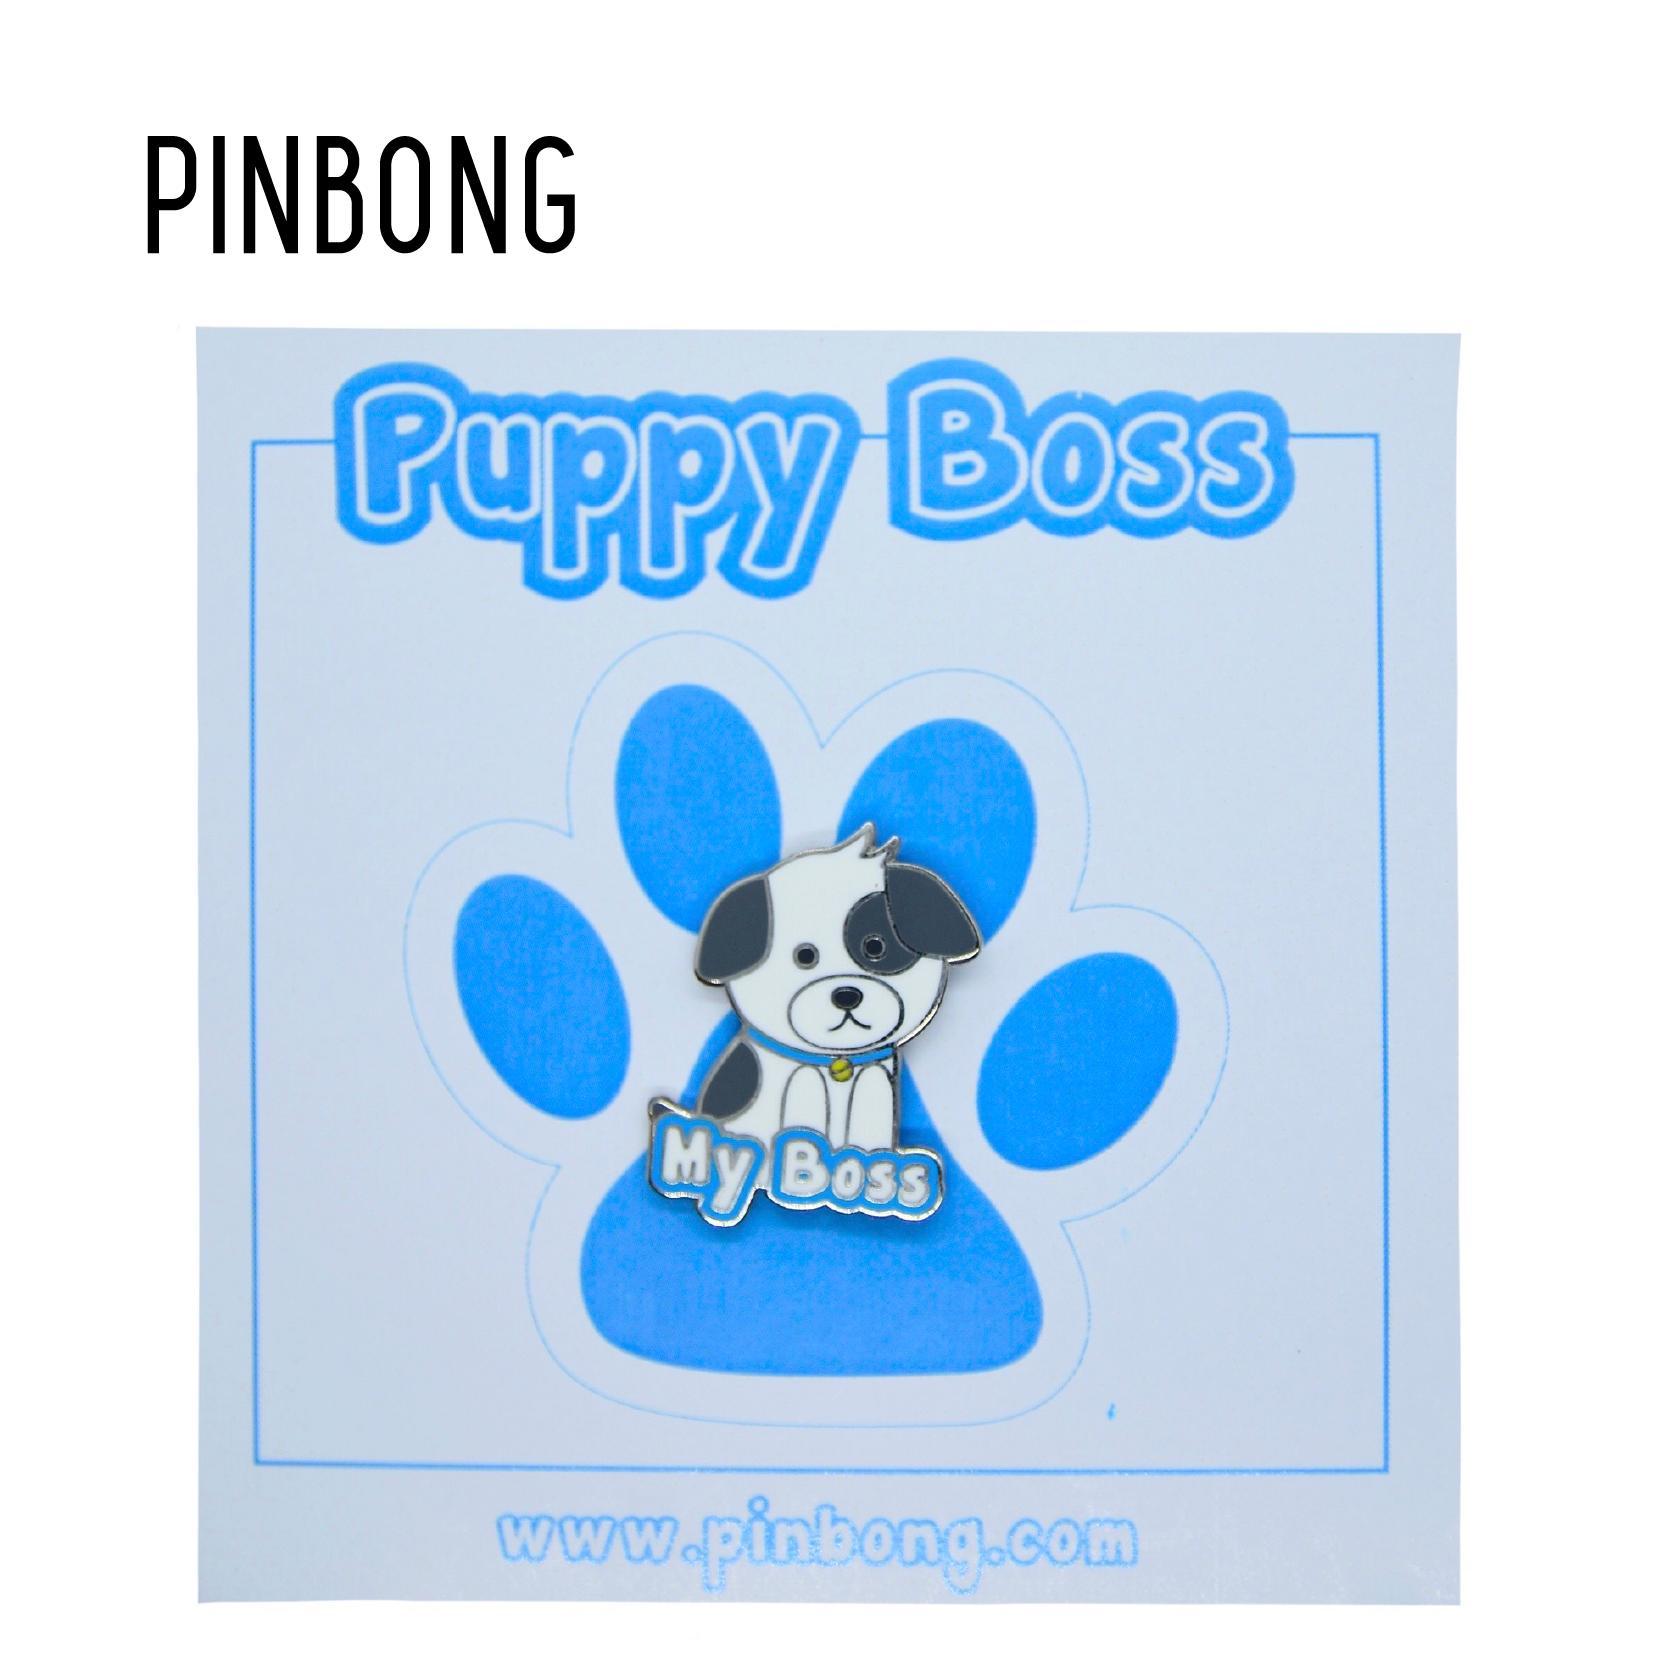 Huy Hiệu Puppy Boss PINBONG